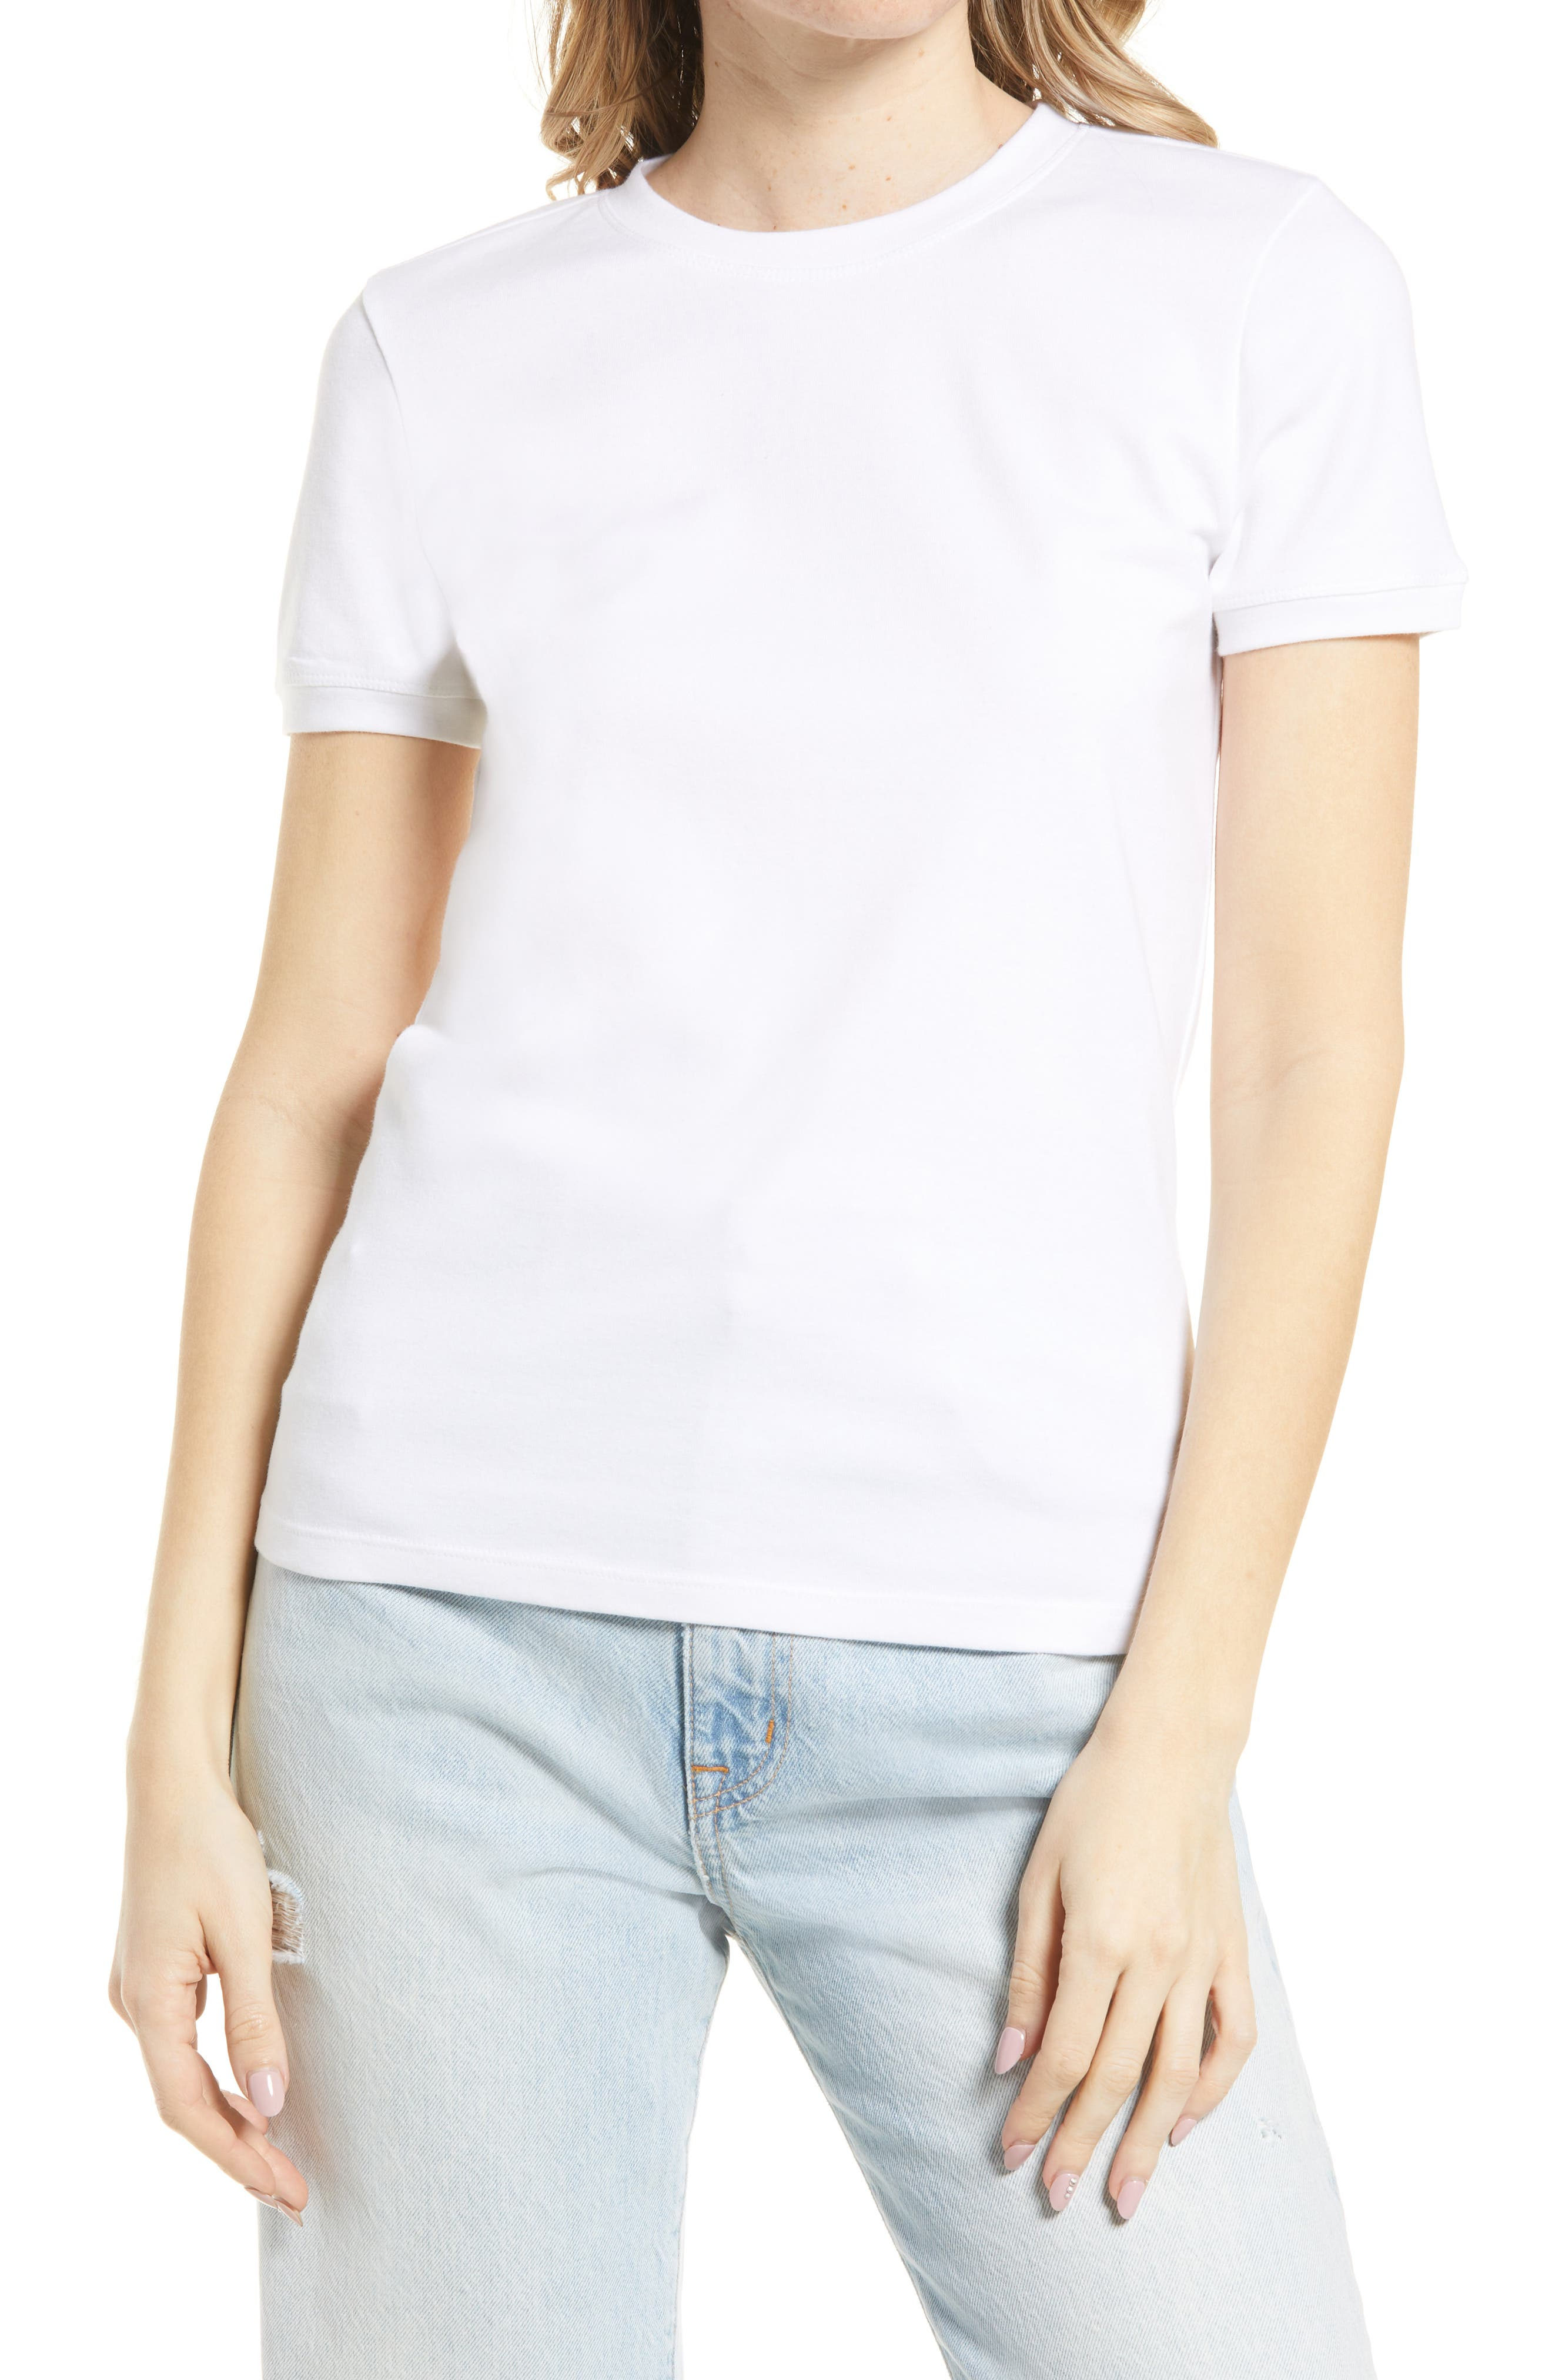 50s Shirts & Tops Womens Treasure  Bond Tonal Ringer T-Shirt Size X-Large - White $29.00 AT vintagedancer.com